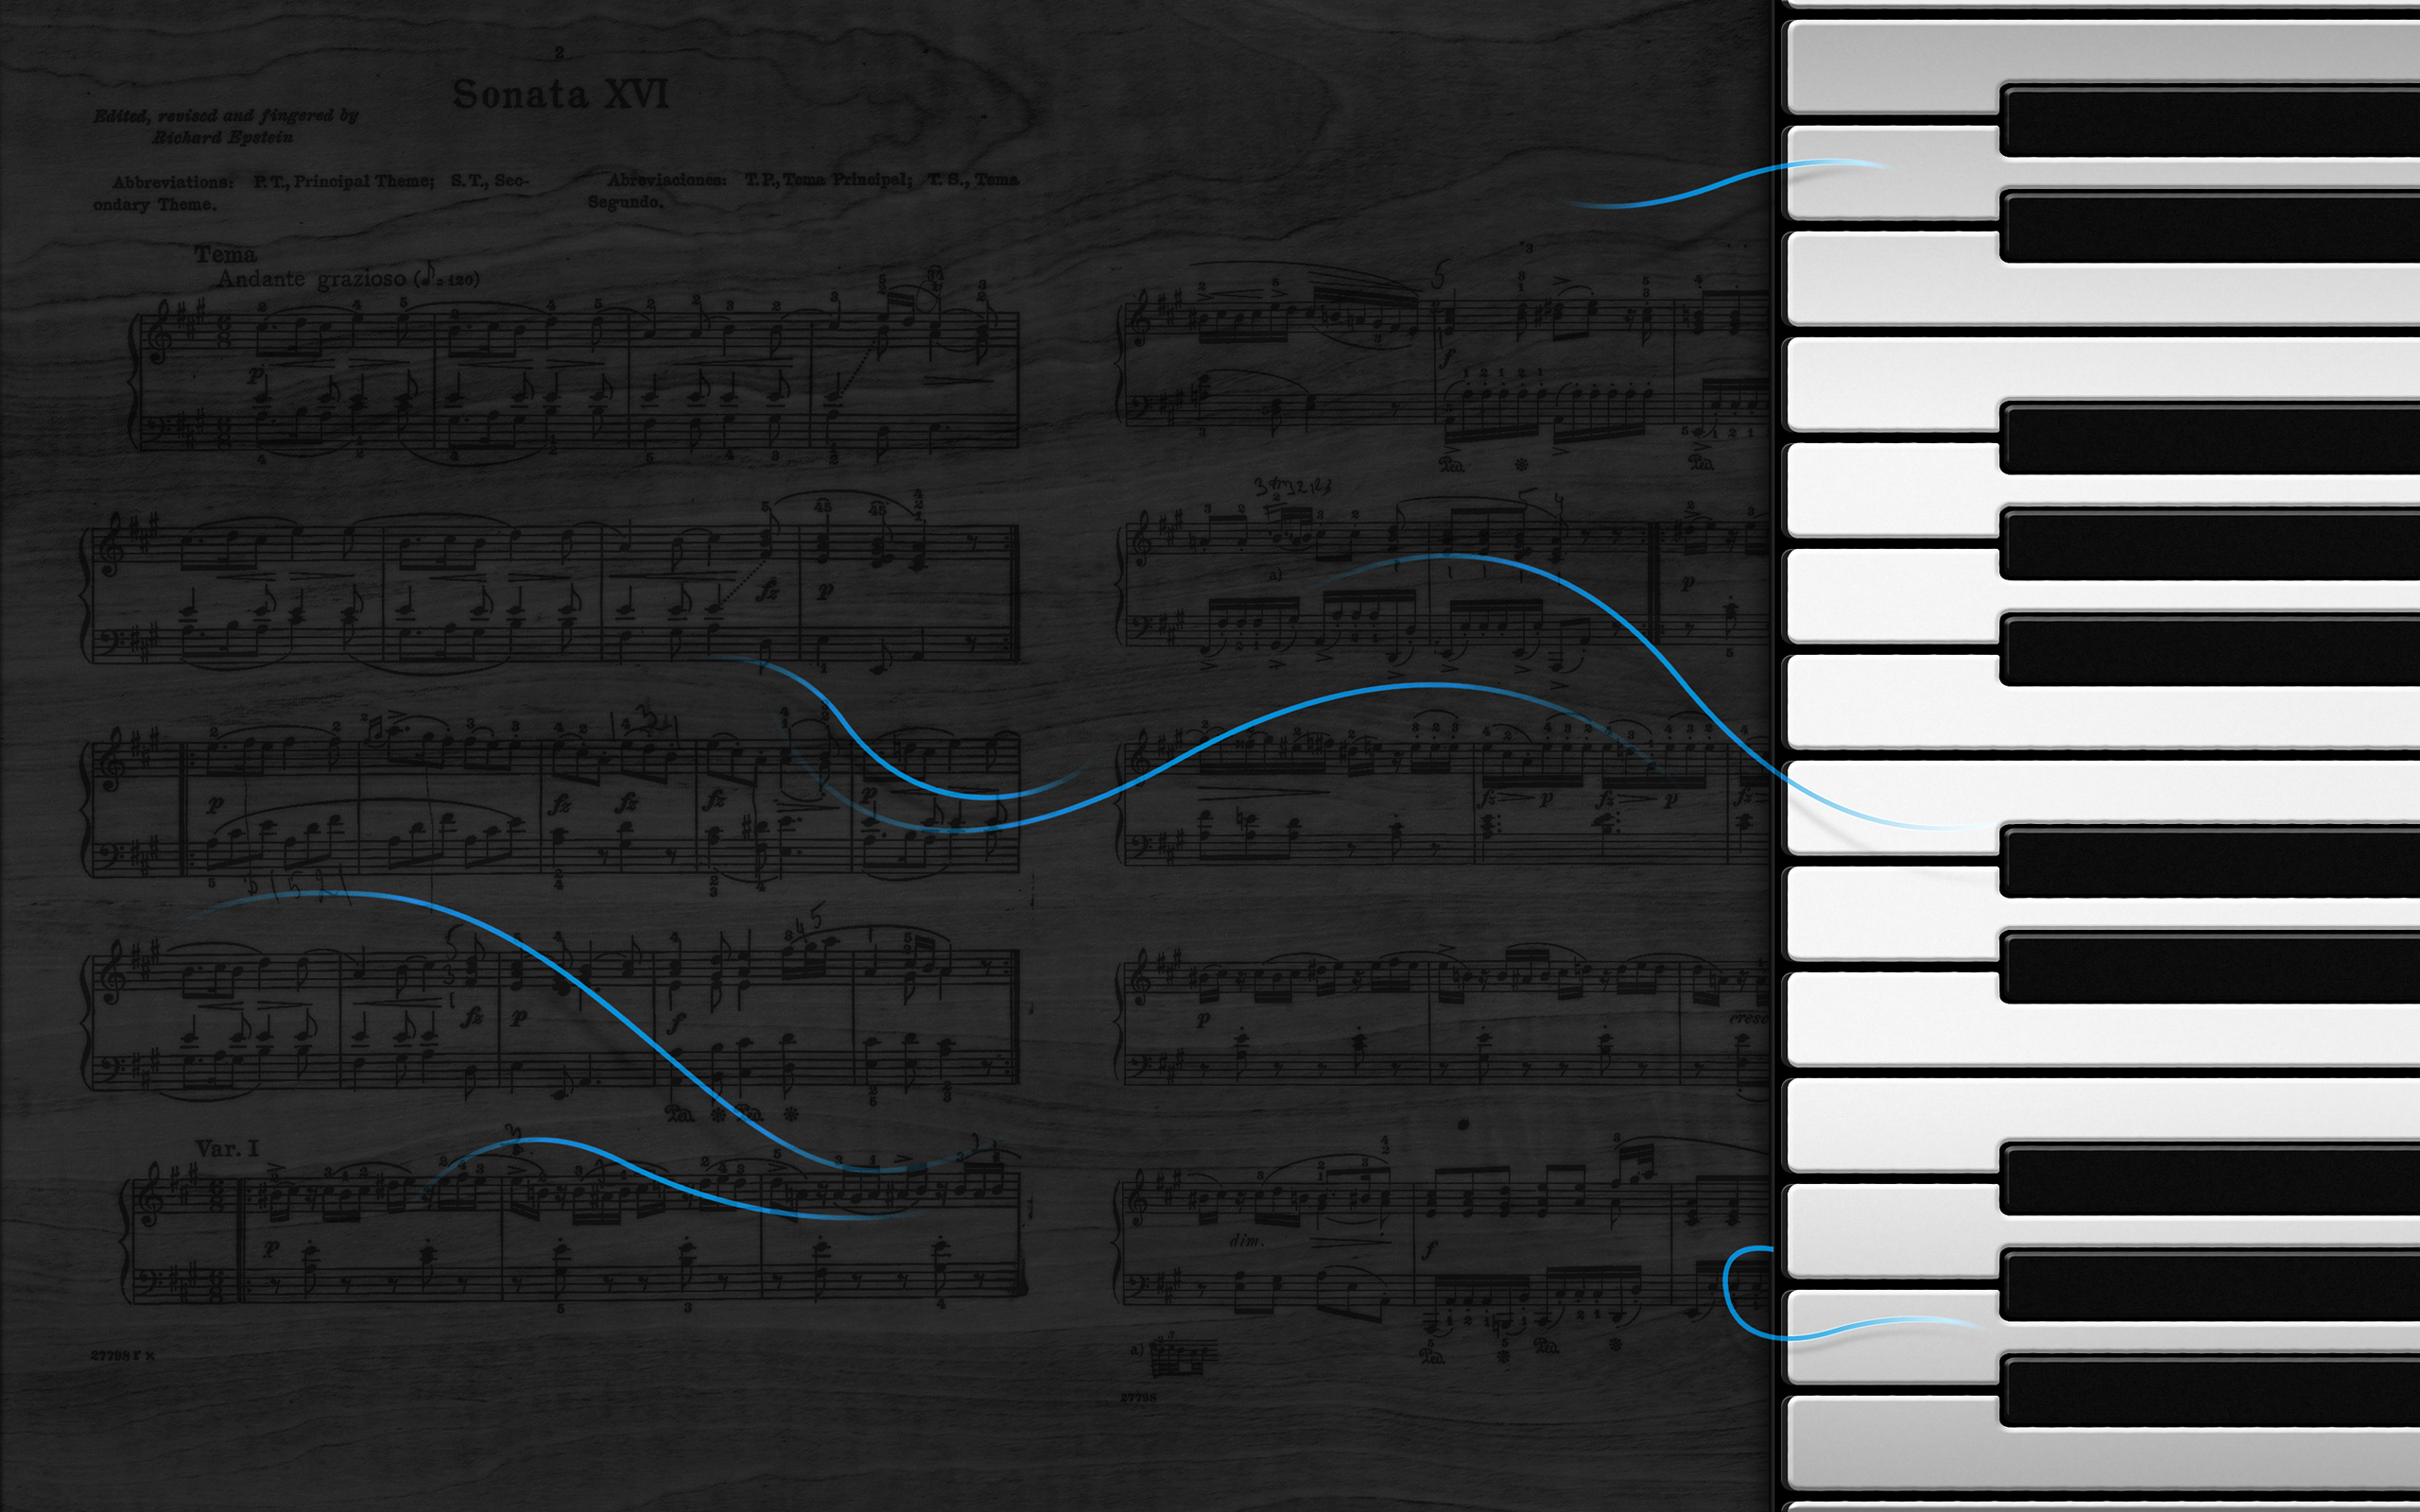 Free Download Wallpapers For Computer Desktop Keyboard 2560x1600 For Your Desktop Mobile Tablet Explore 47 Piano Desktop Wallpaper Piano Keys Wallpaper Grand Piano Wallpaper Piano Images Wallpaper